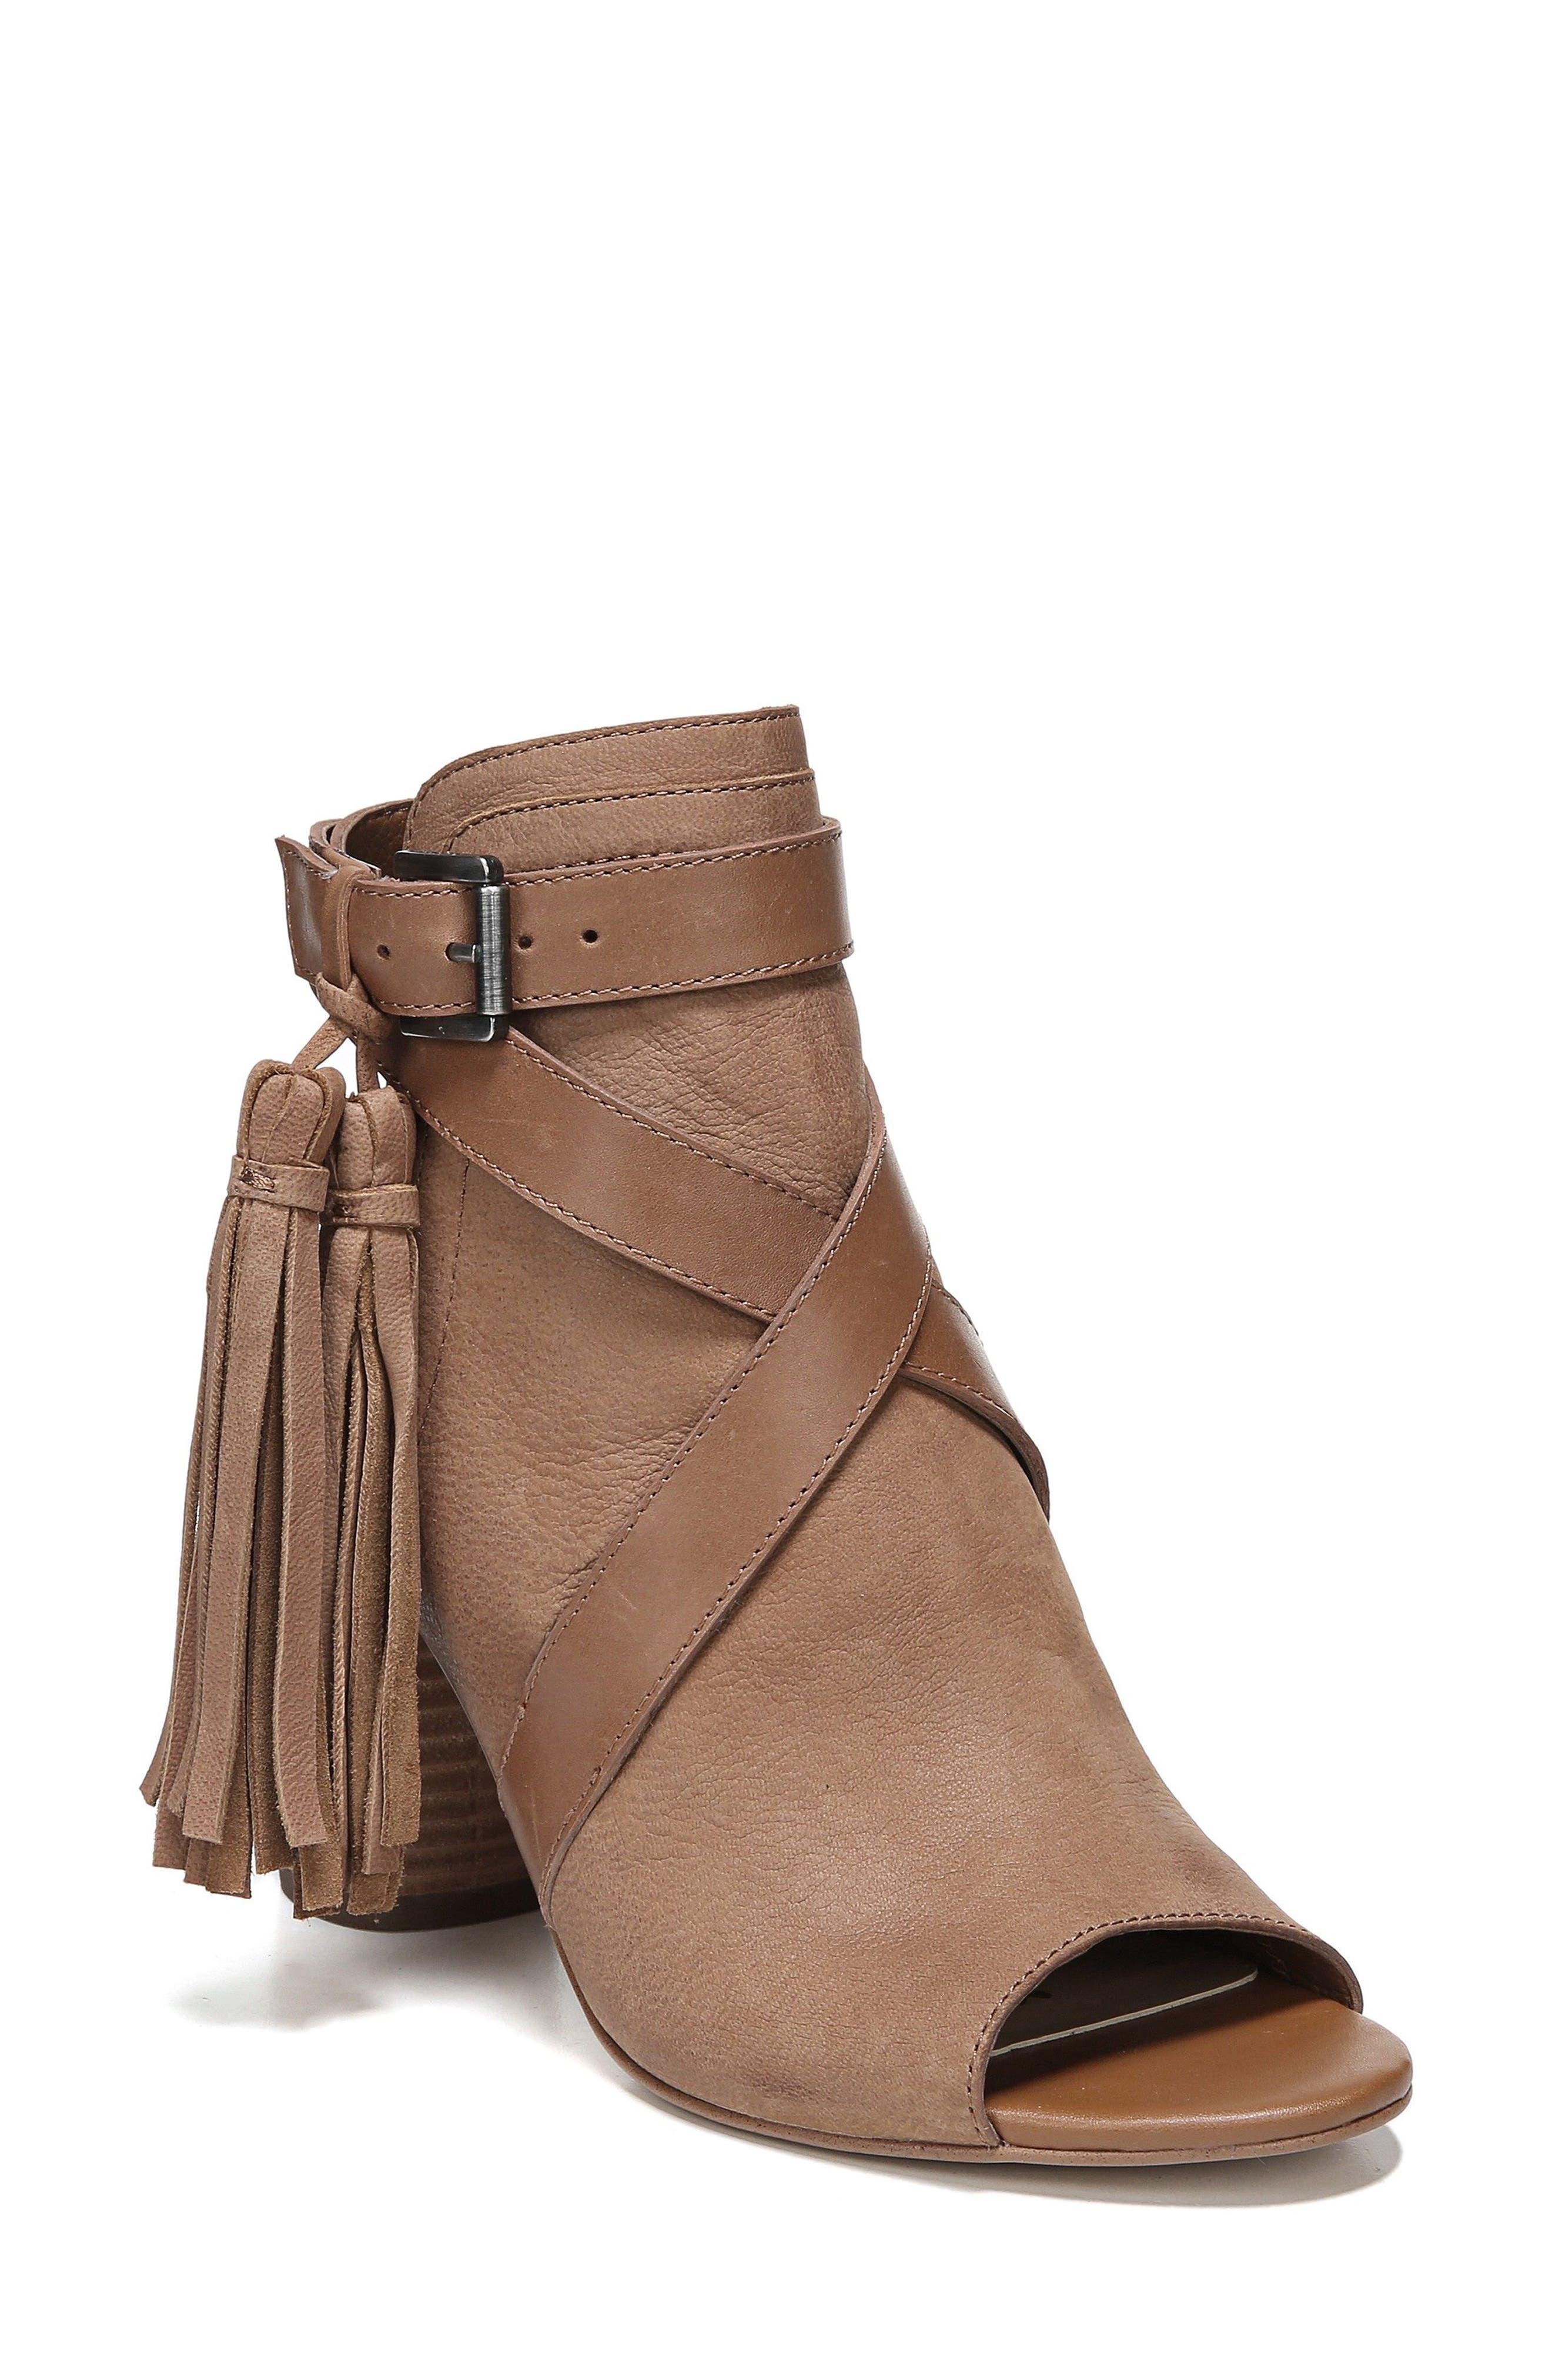 Vermont Block Heel Sandal,                             Main thumbnail 1, color,                             Deep Saddle Nubuck Leather